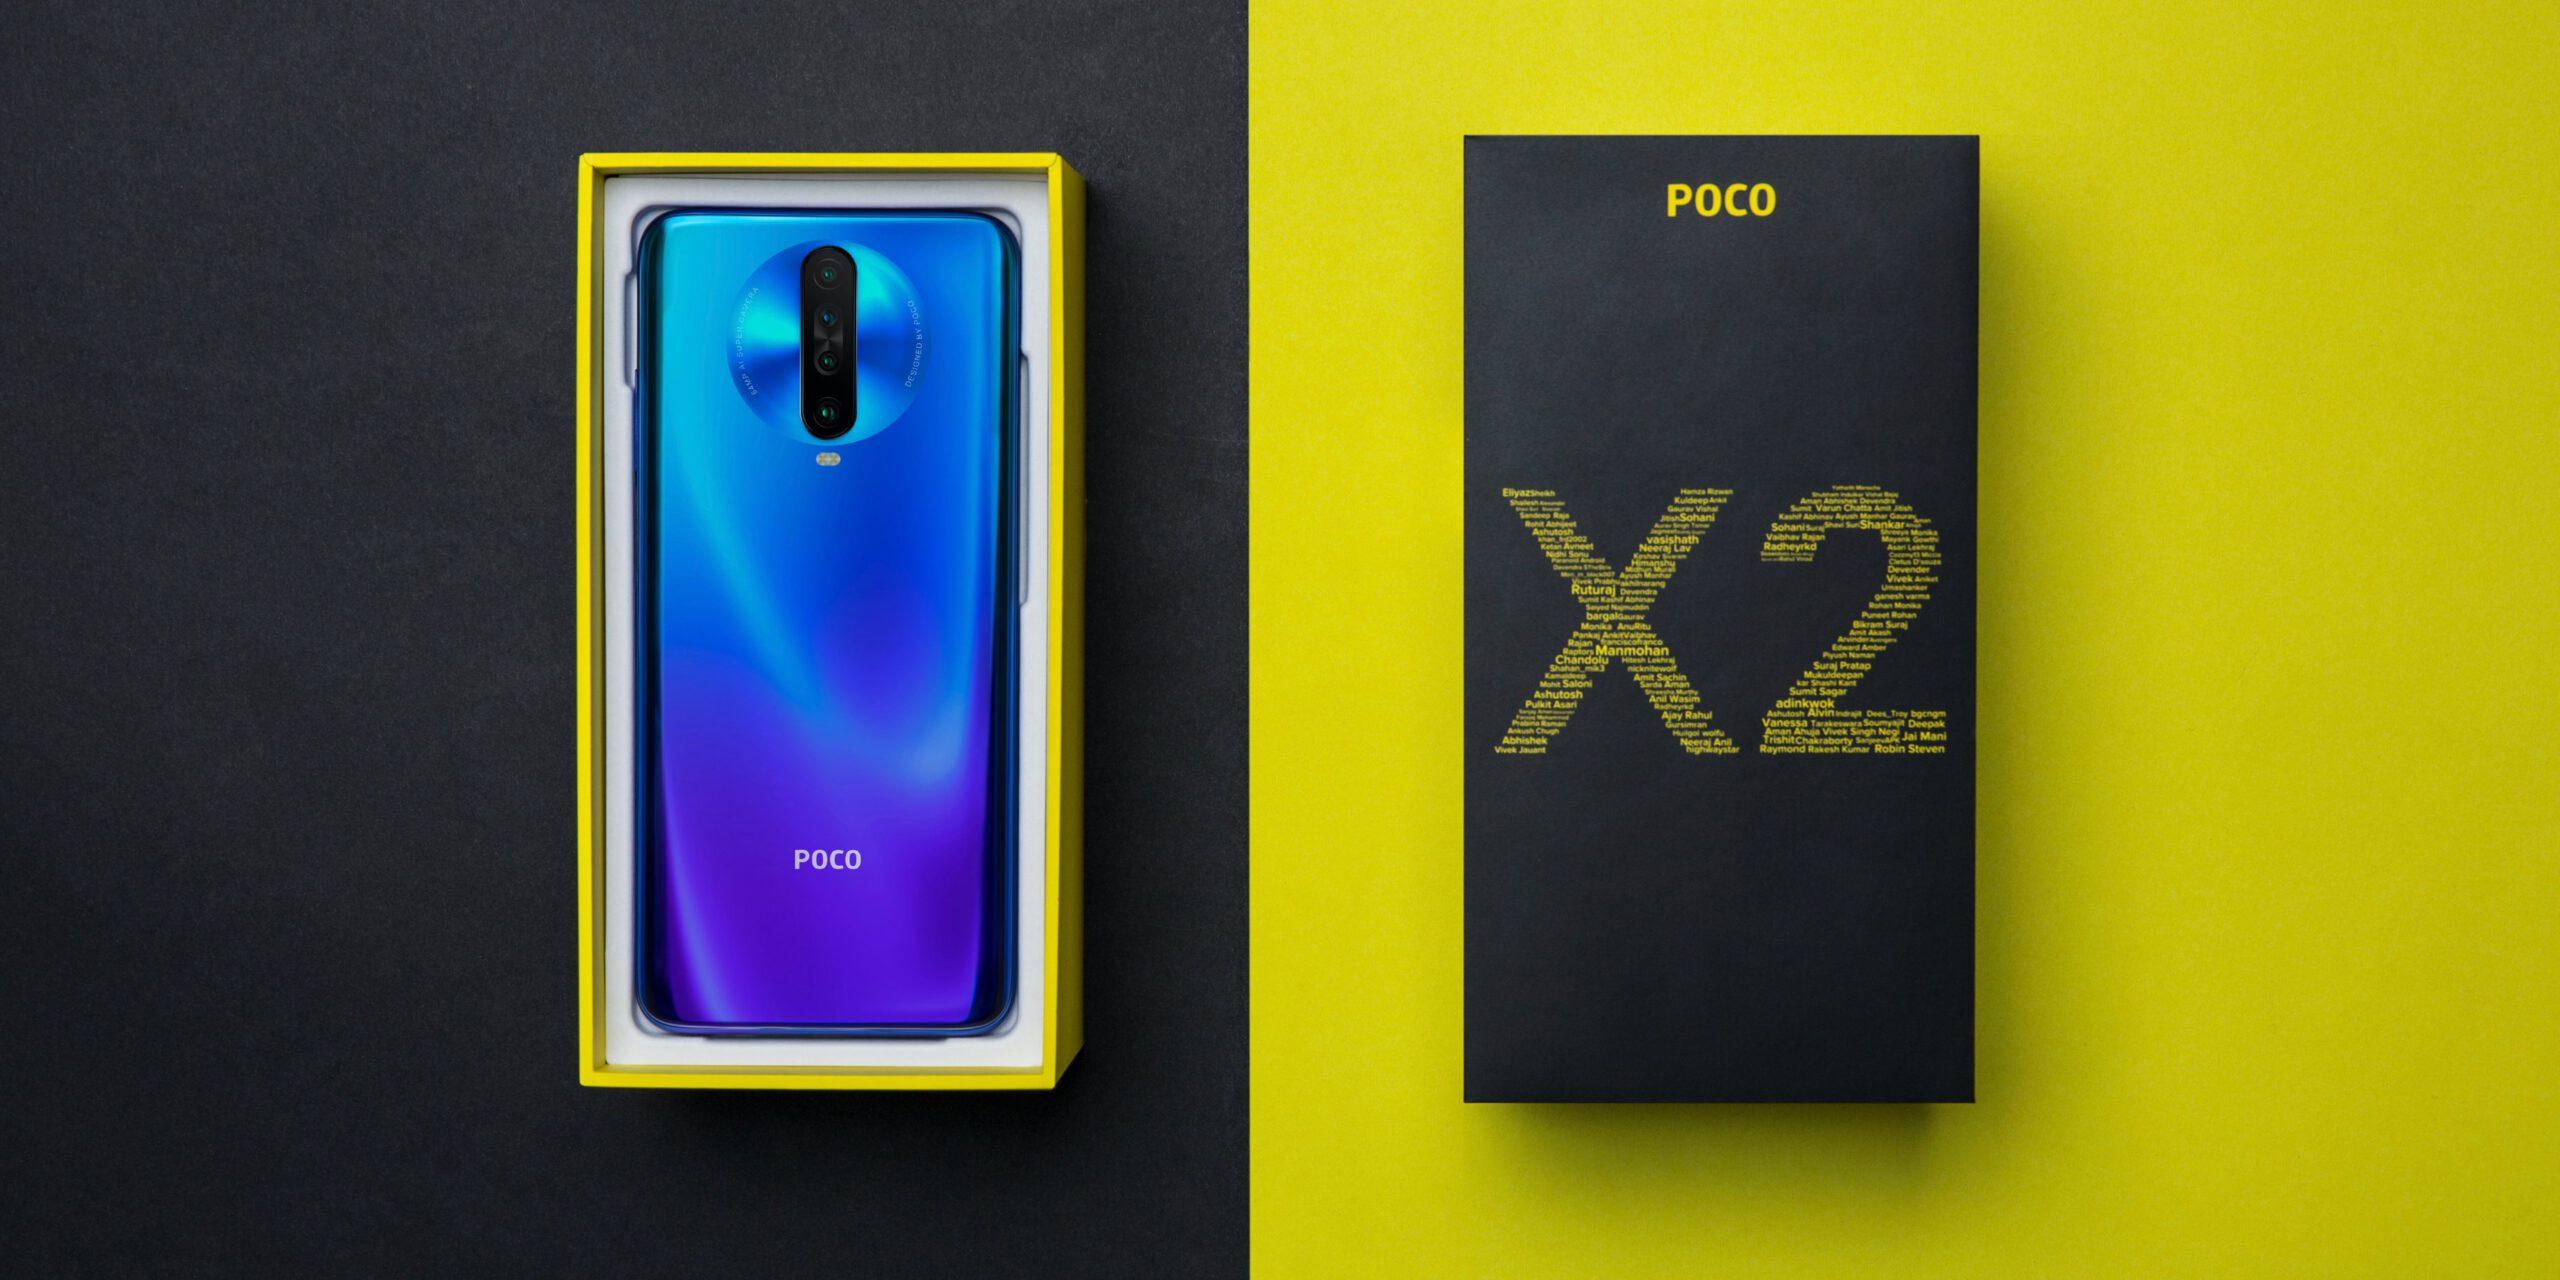 Poco X2 Android 11